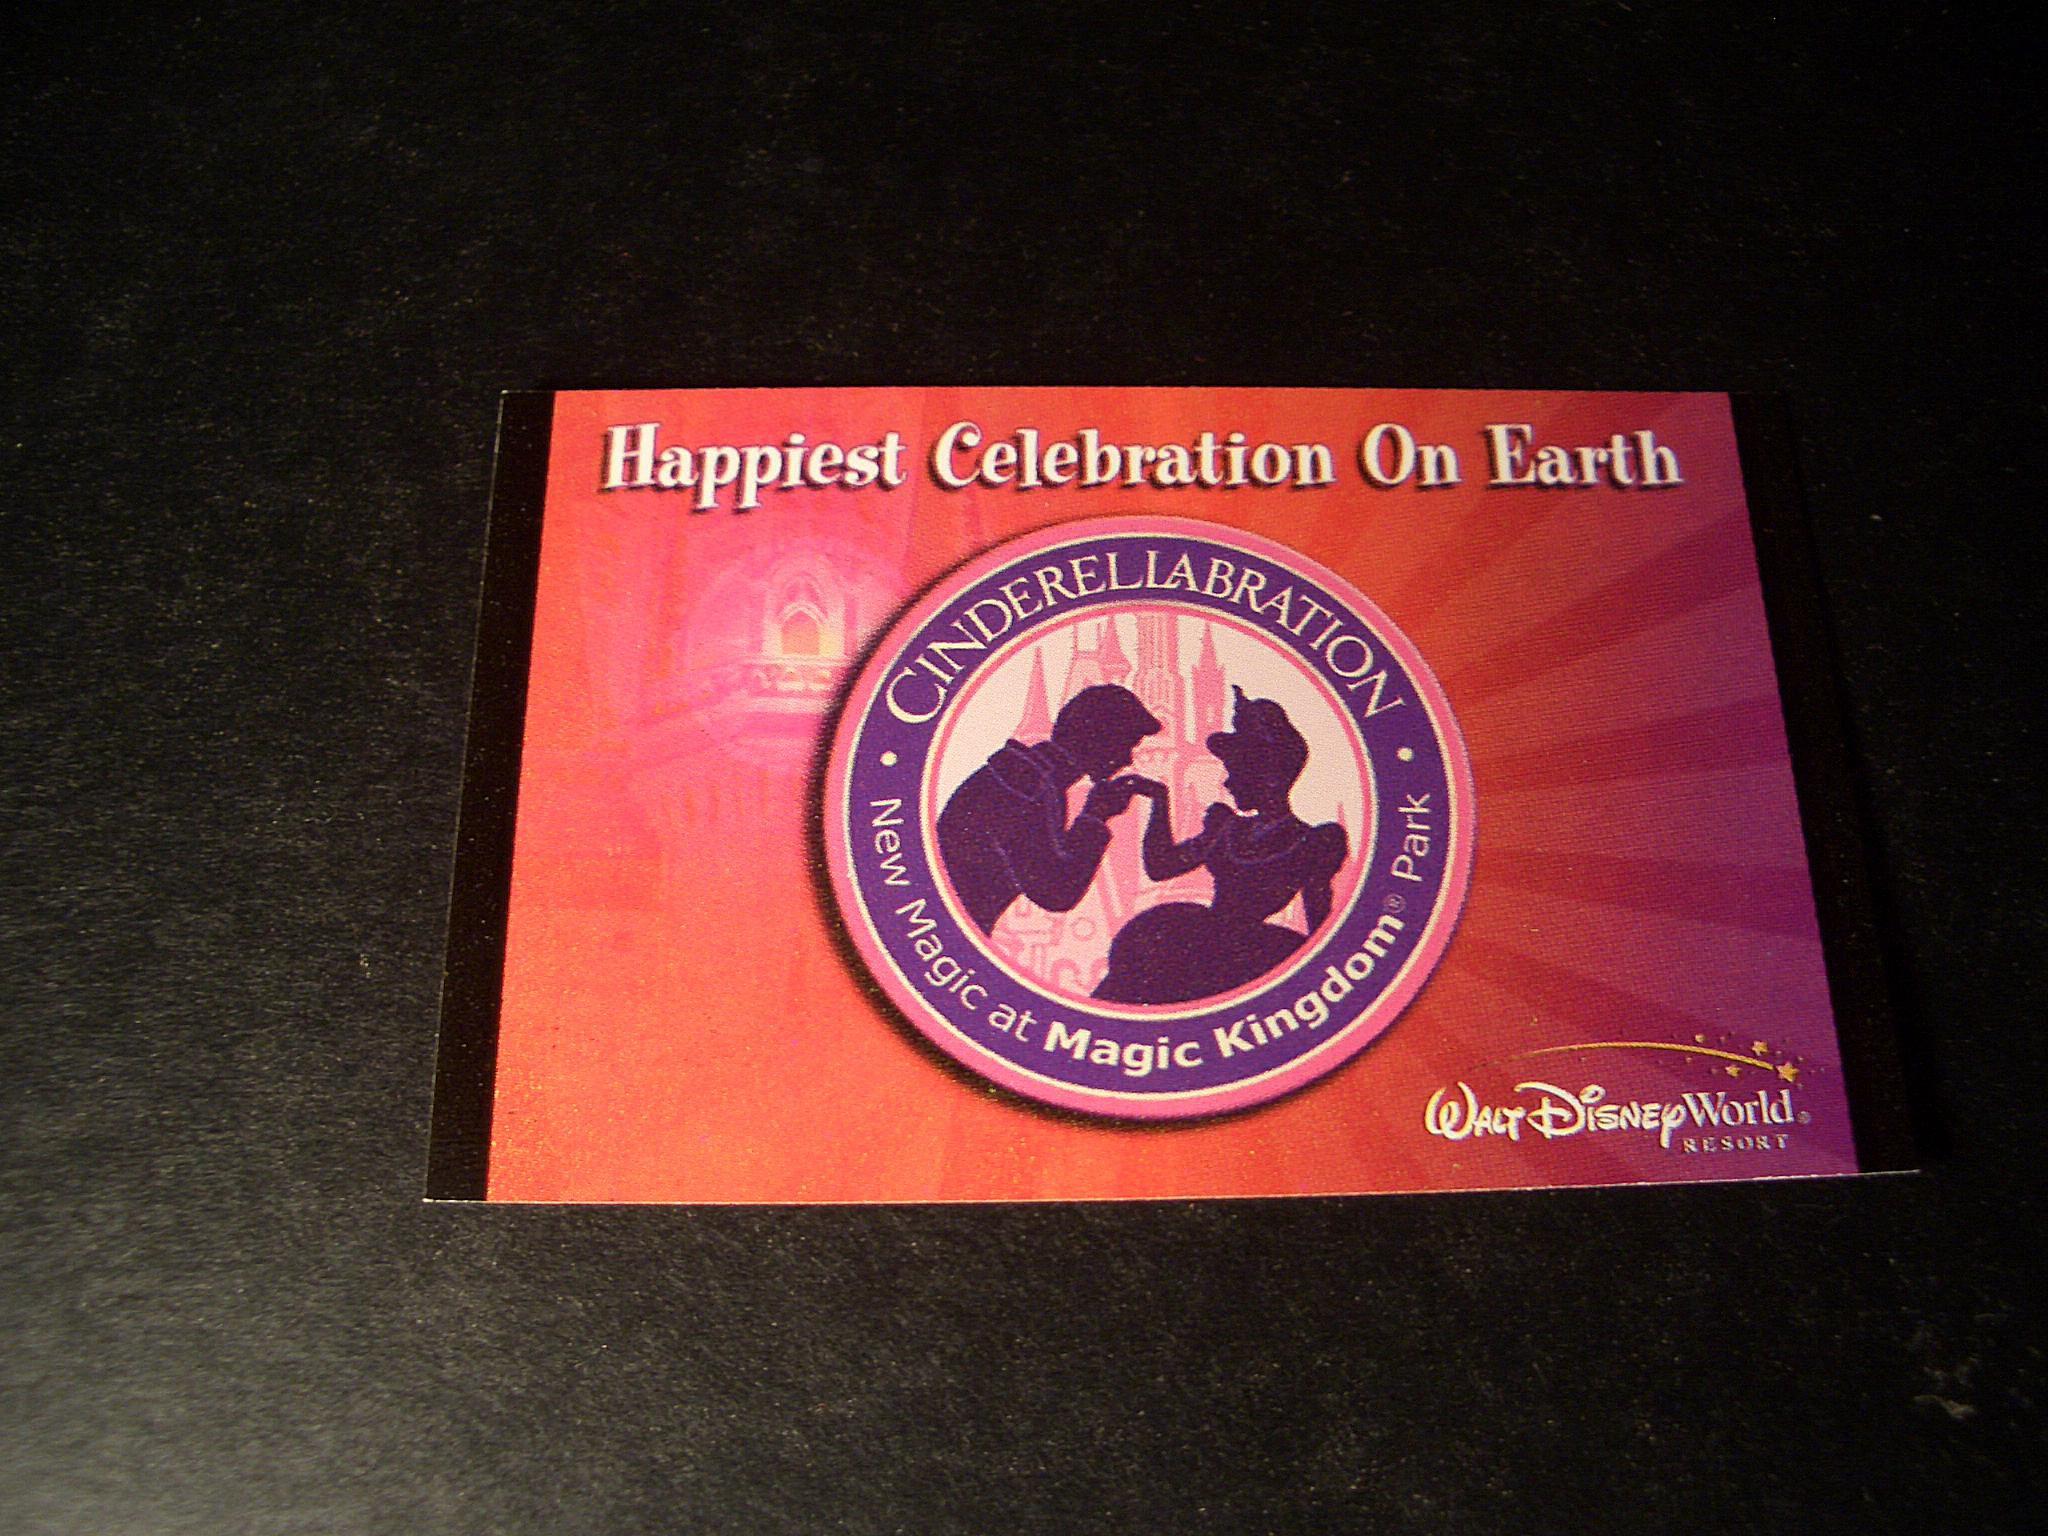 What is Walt Disney s Mission Statement